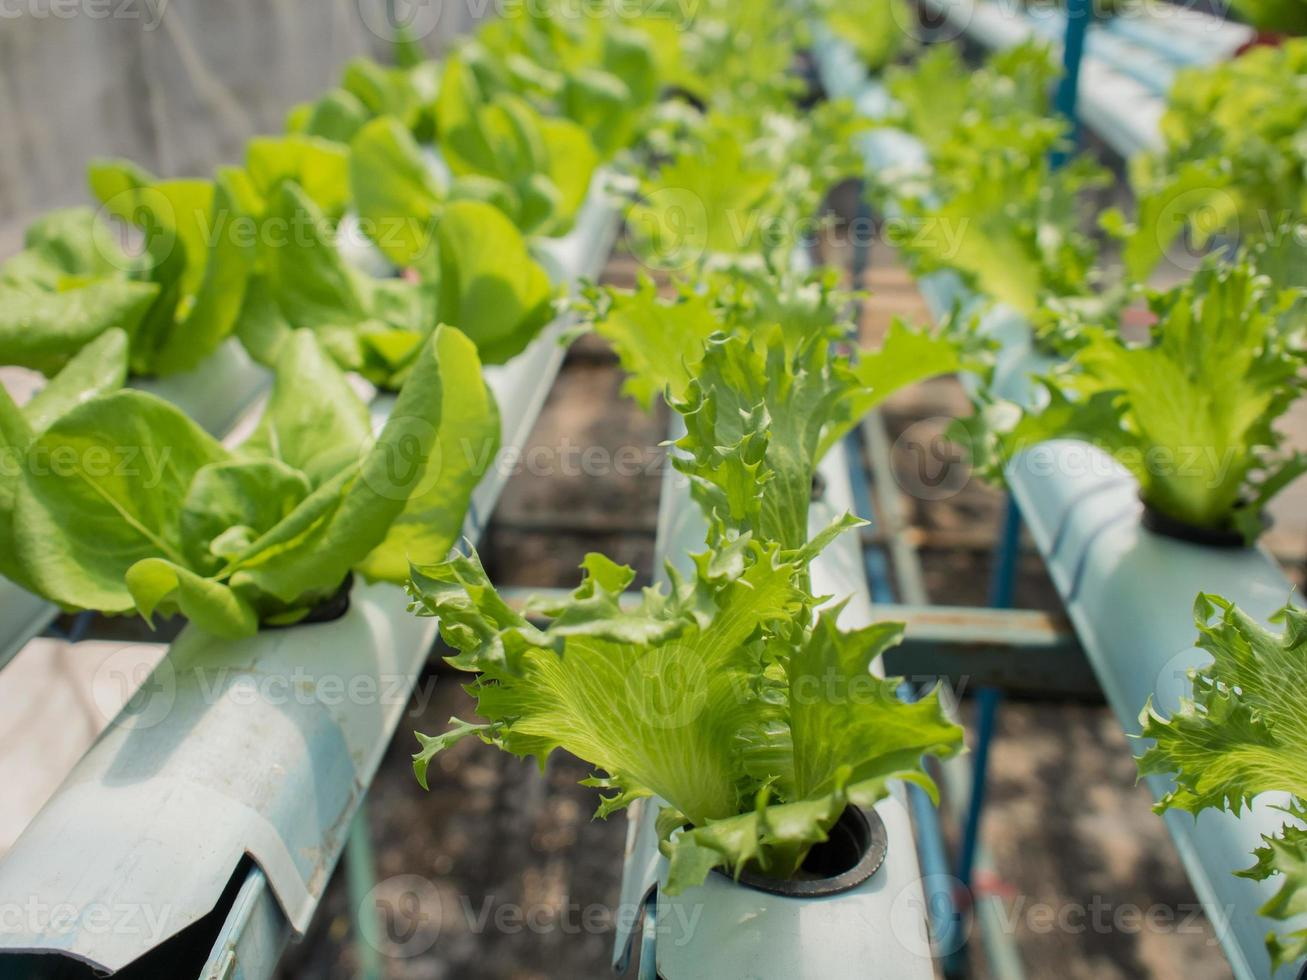 hydroponic plants photo